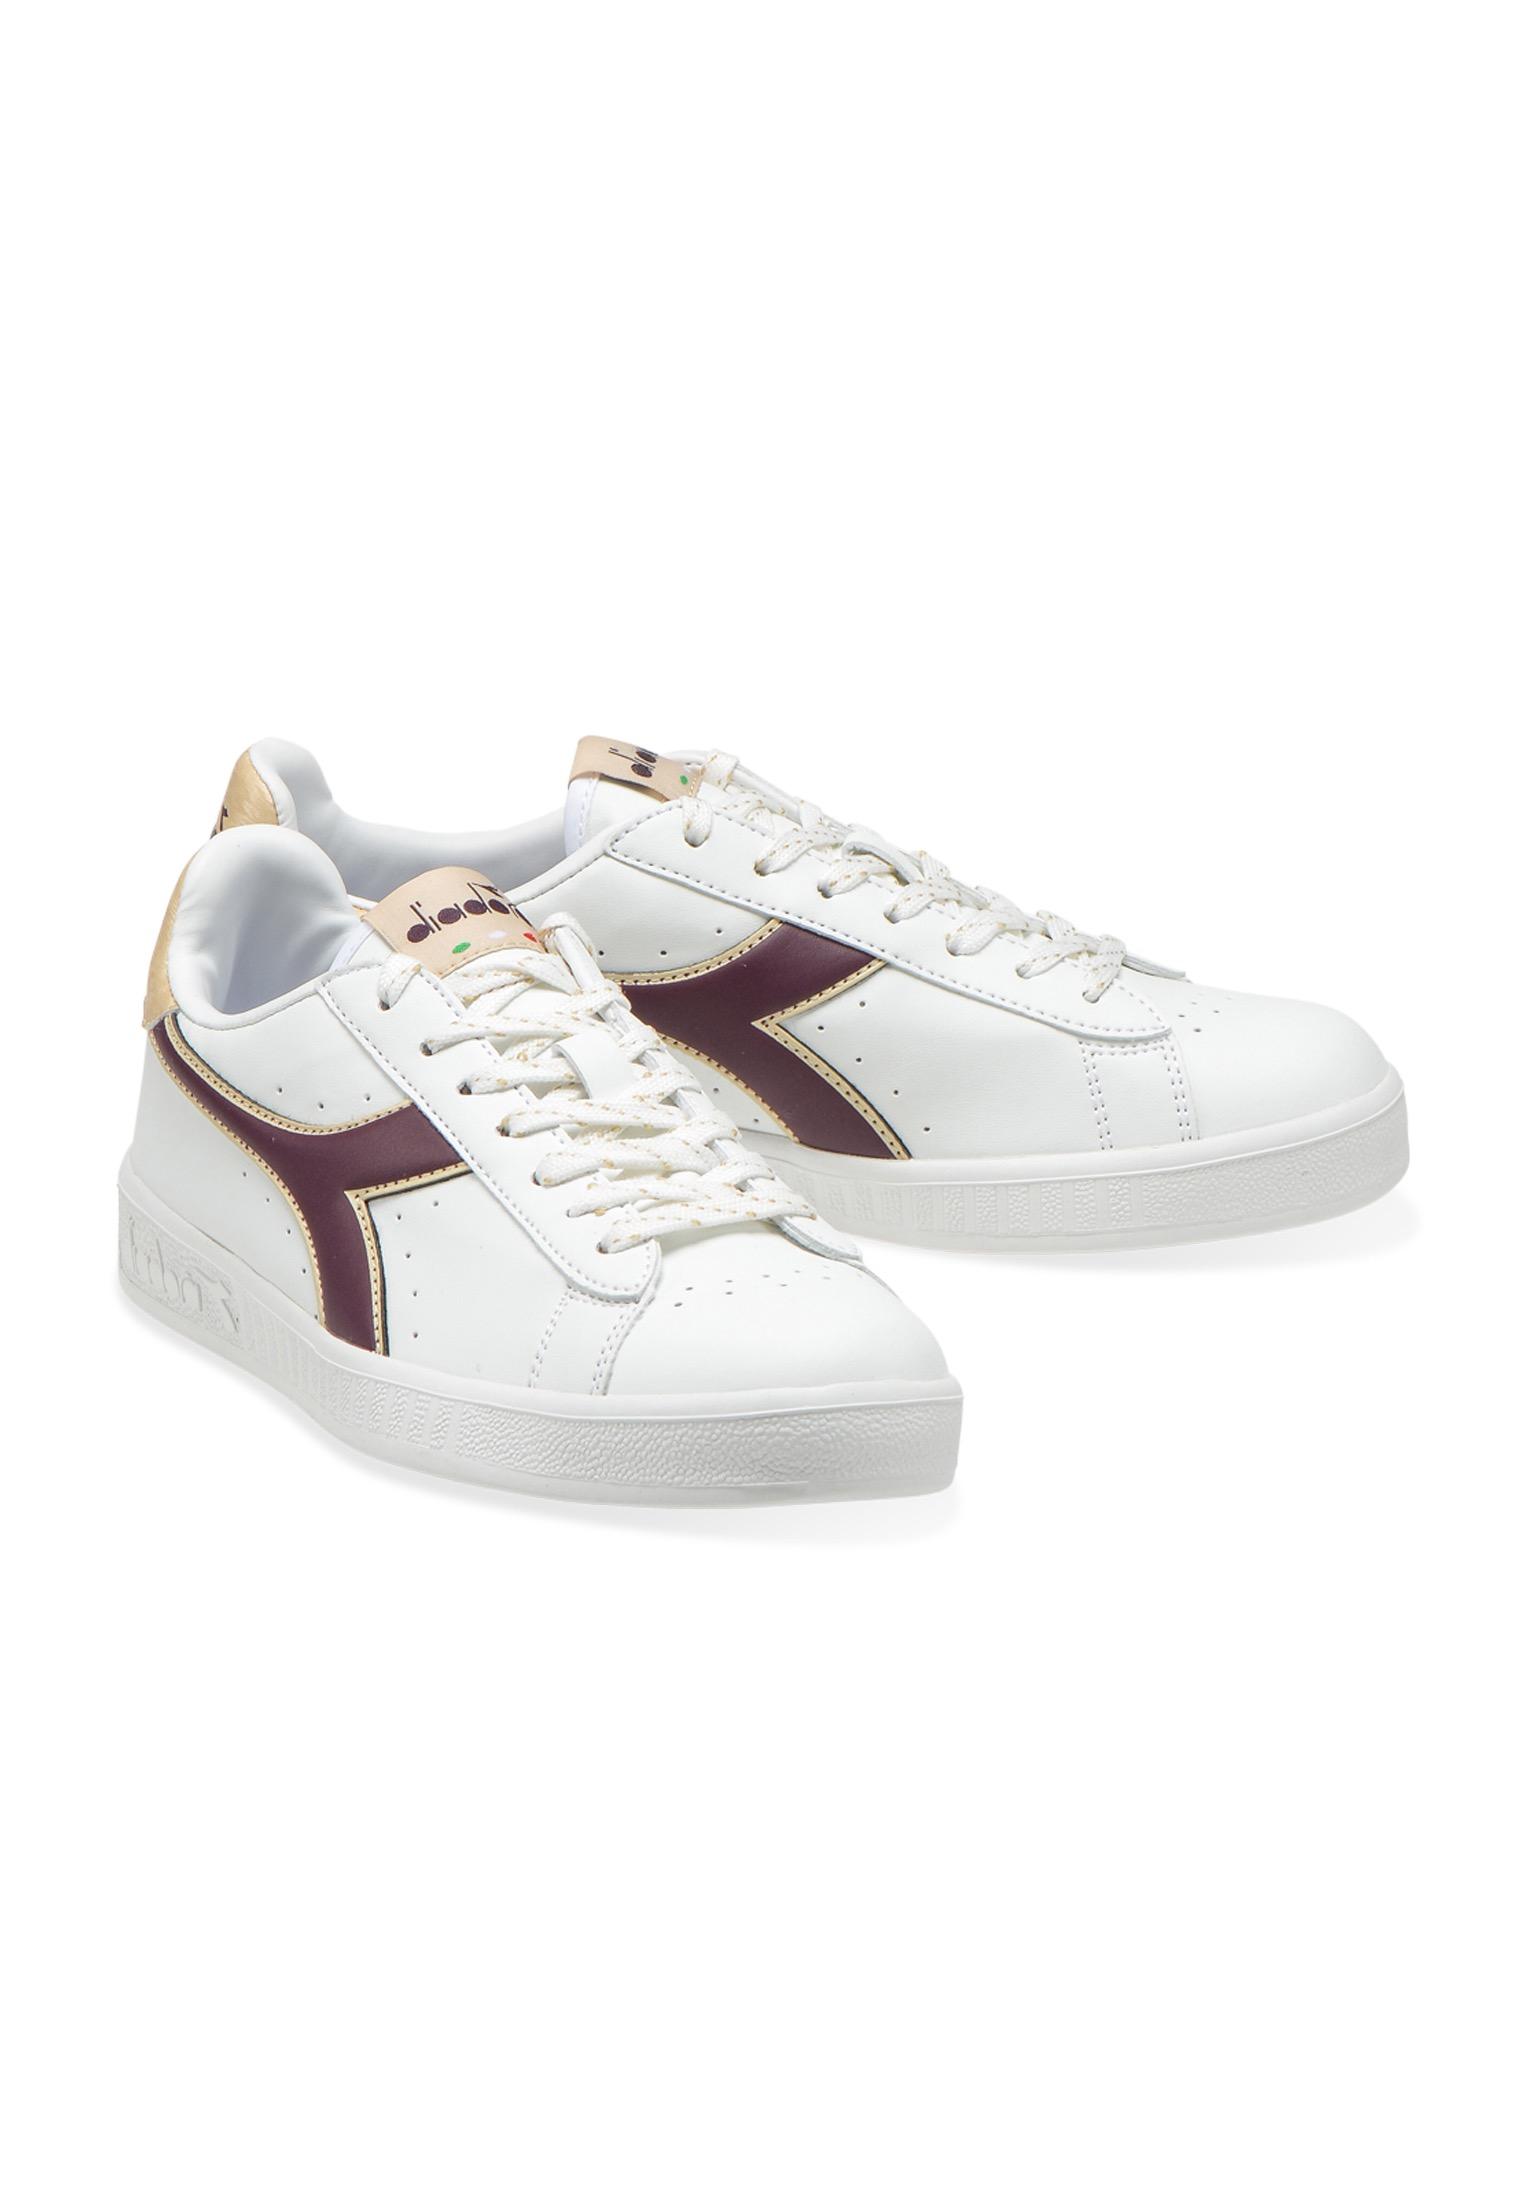 Diadora-Sneakers-GAME-P-WN-para-hombre-y-mujer miniatura 35